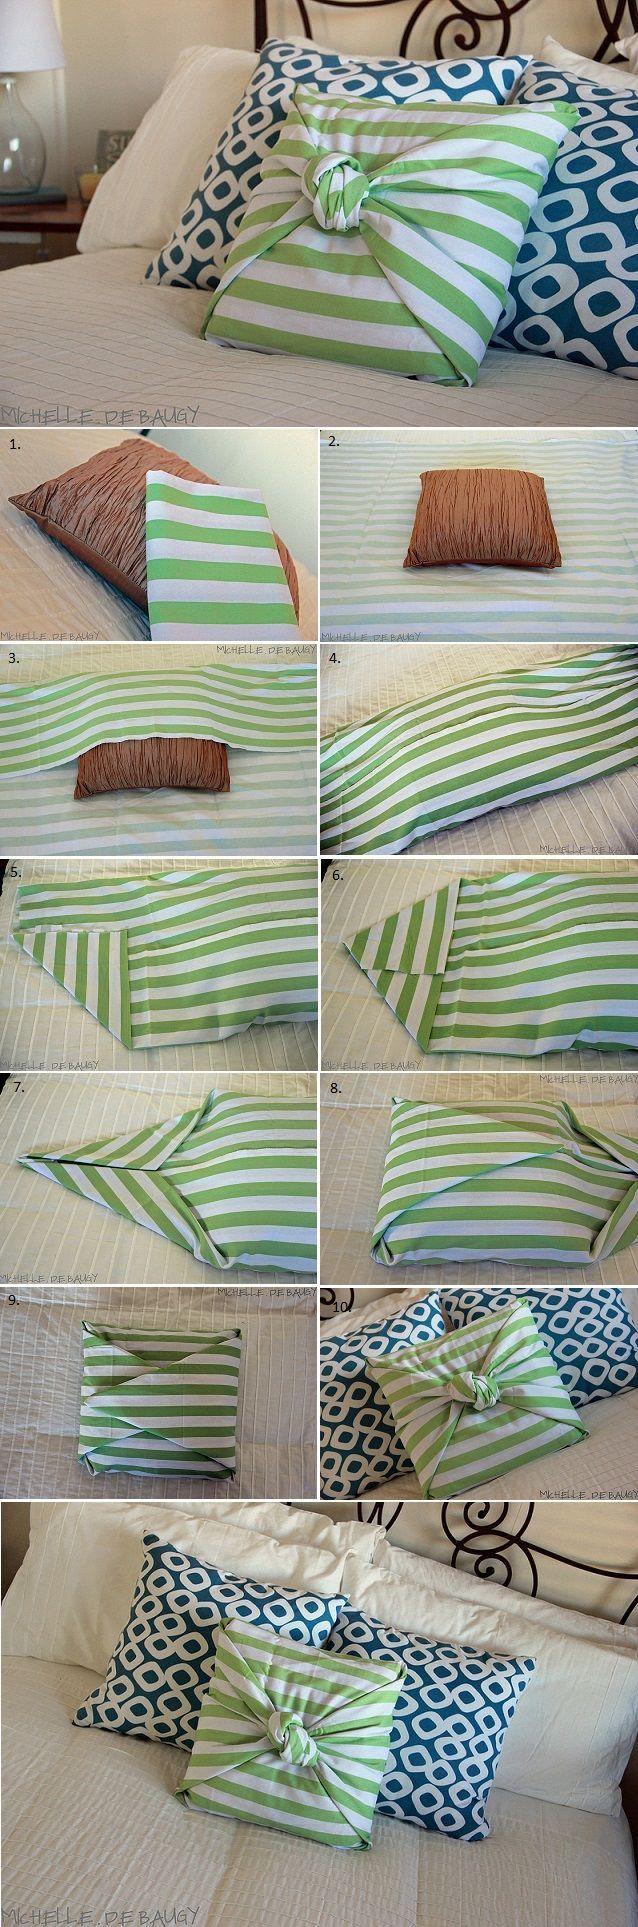 No Sew Pillow Case – DIY #diy #crafts